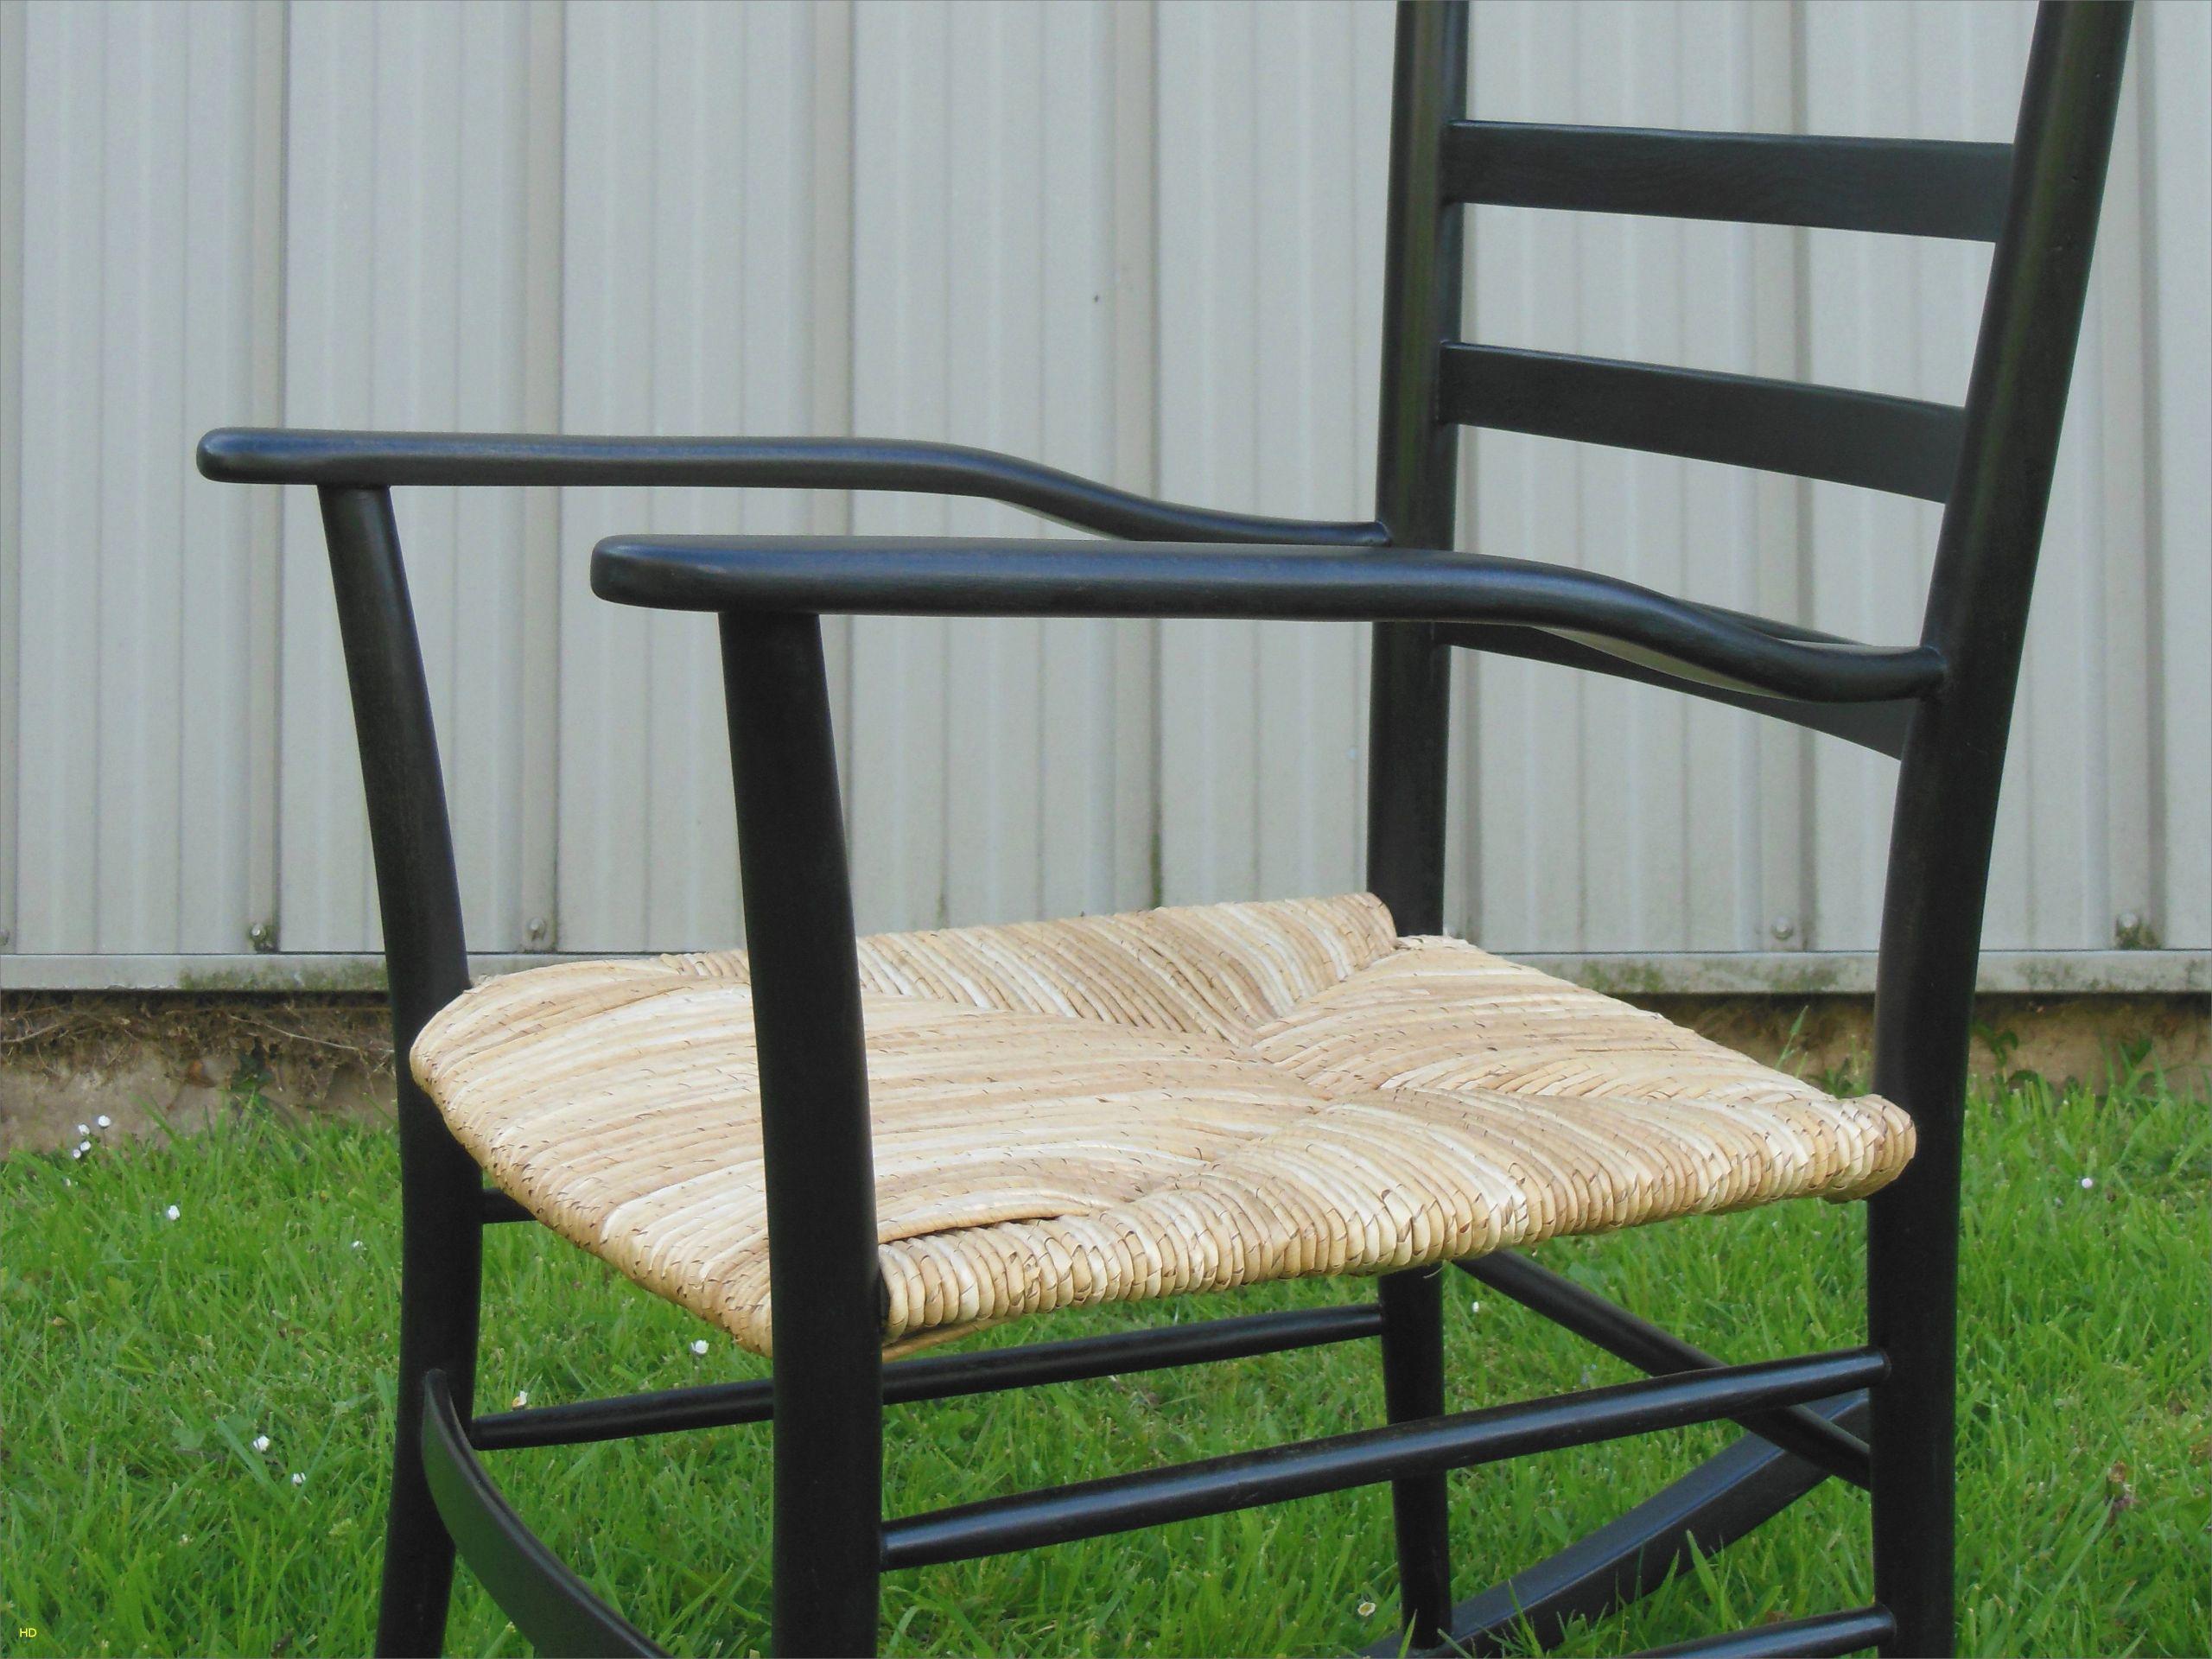 table jardin alinea elegant chaise jardin metal alinea of table jardin alinea